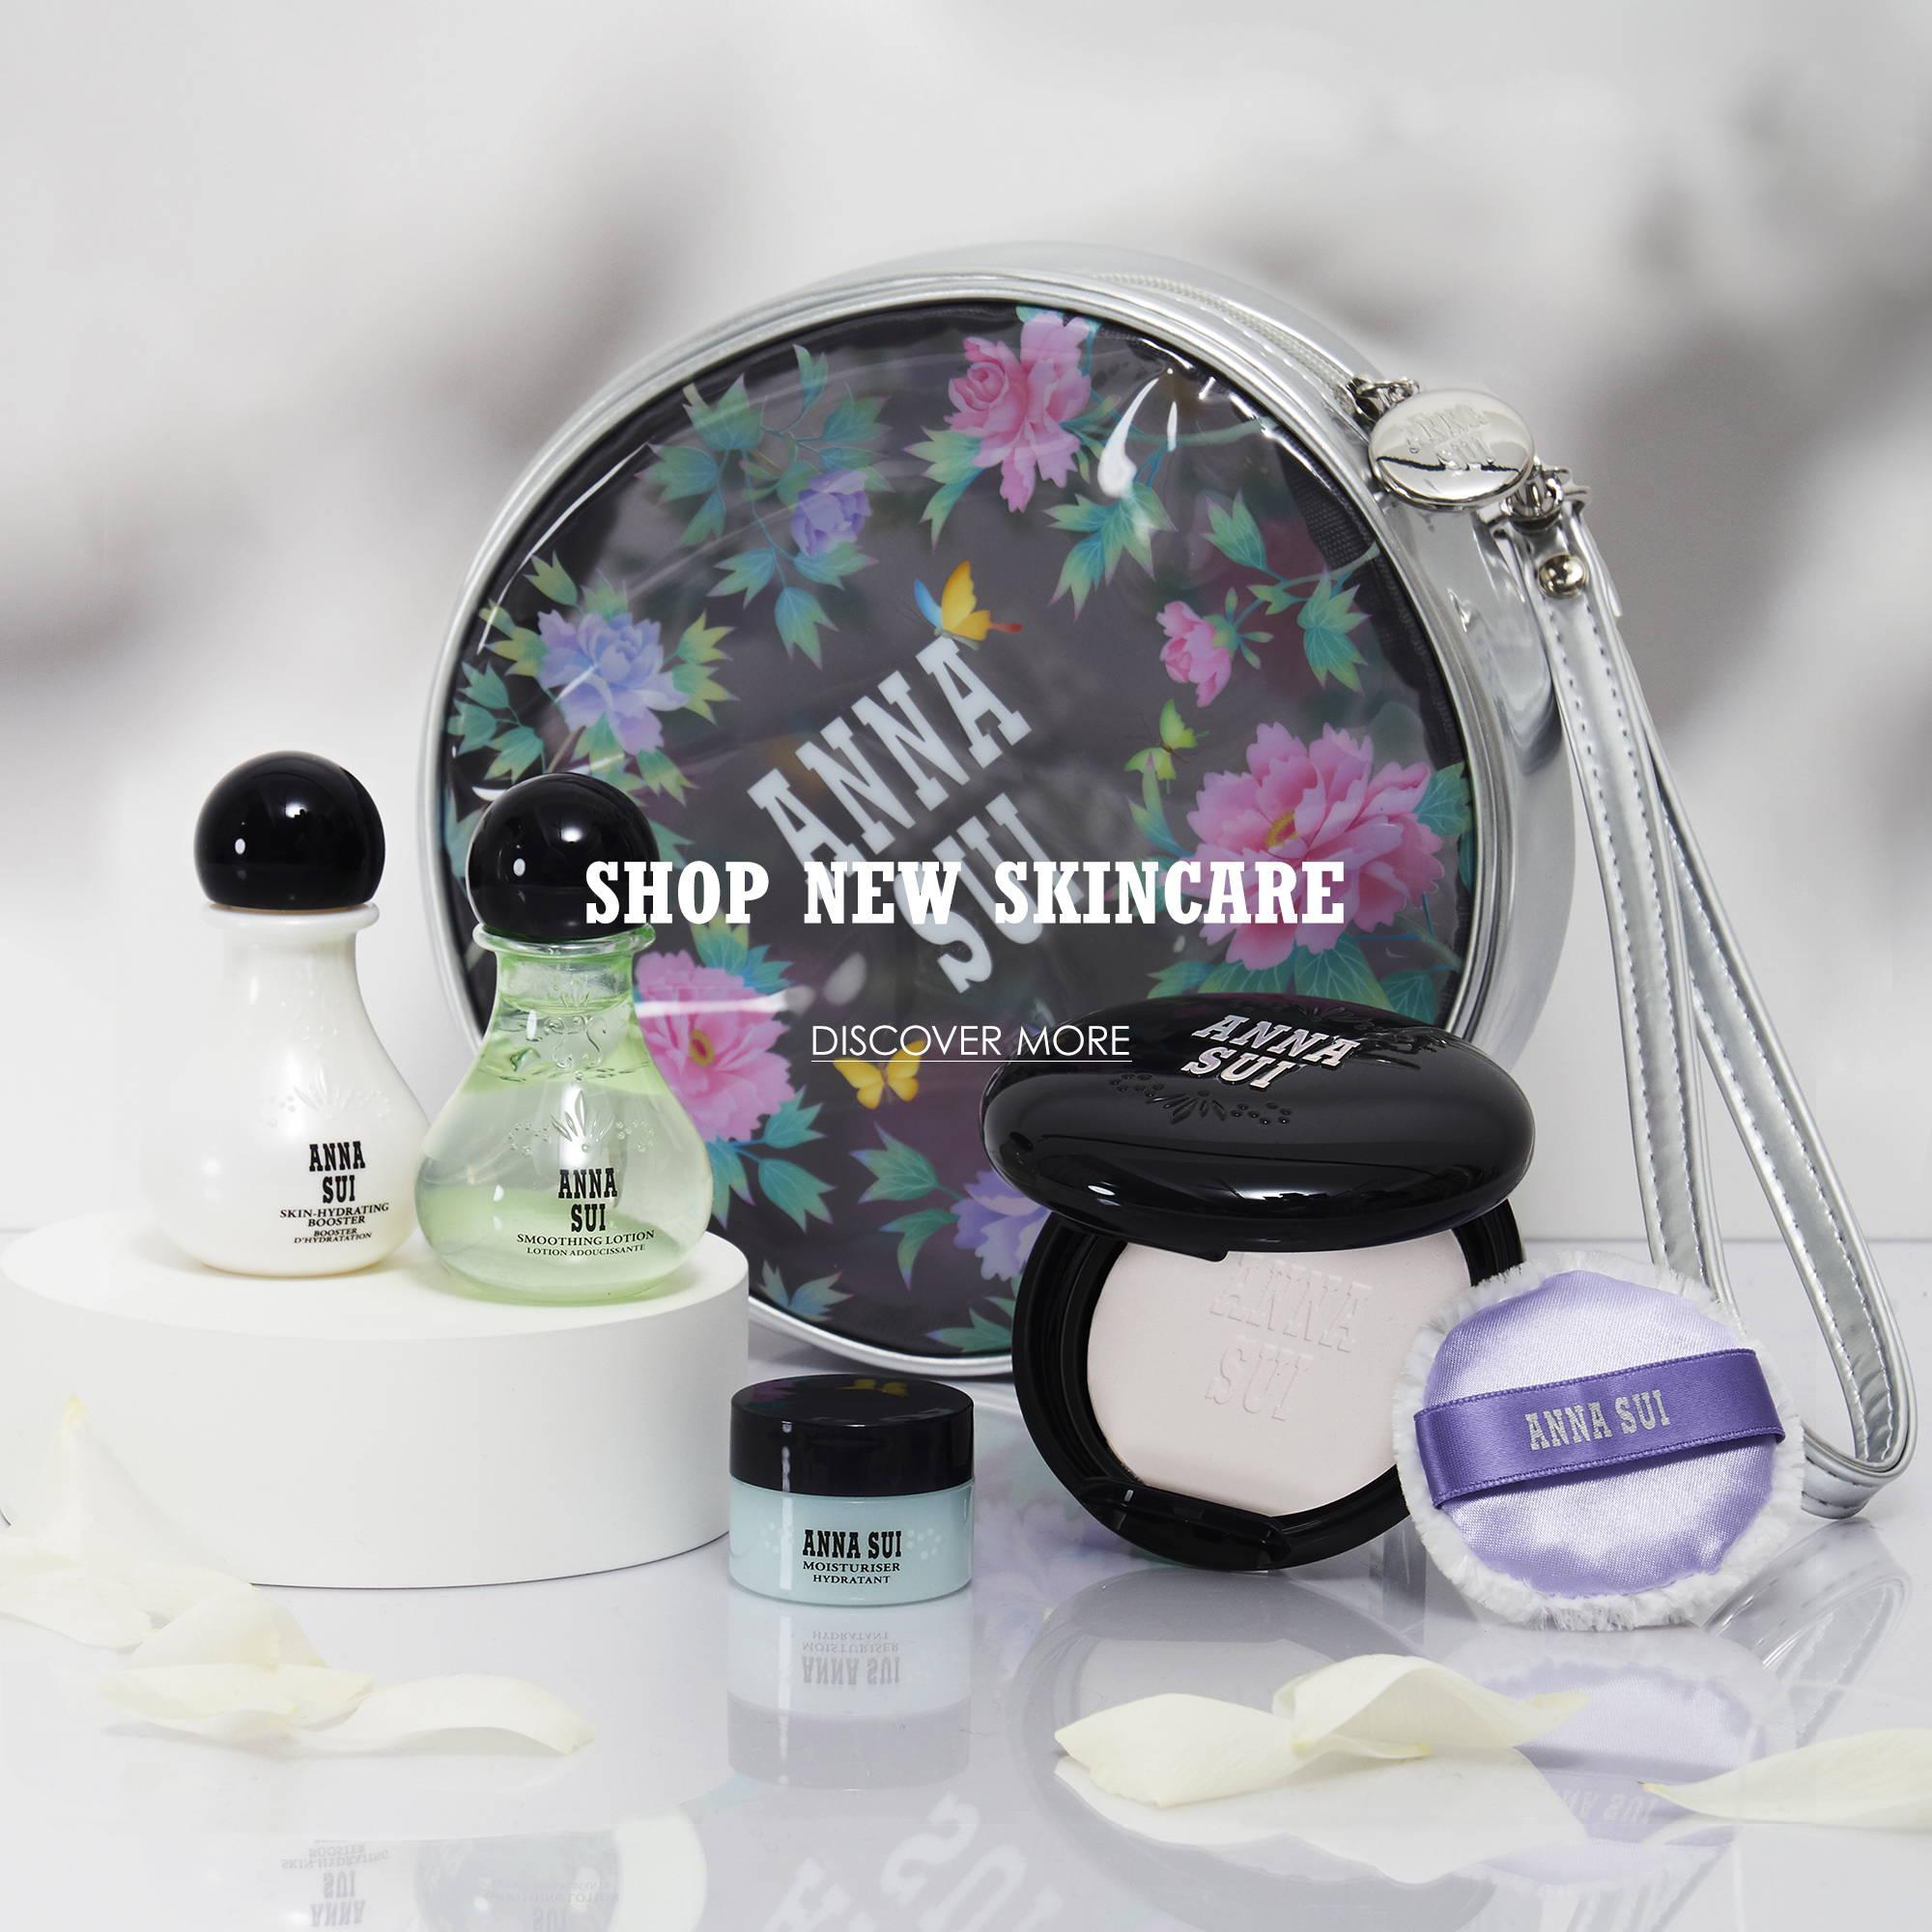 Shop New Skincare